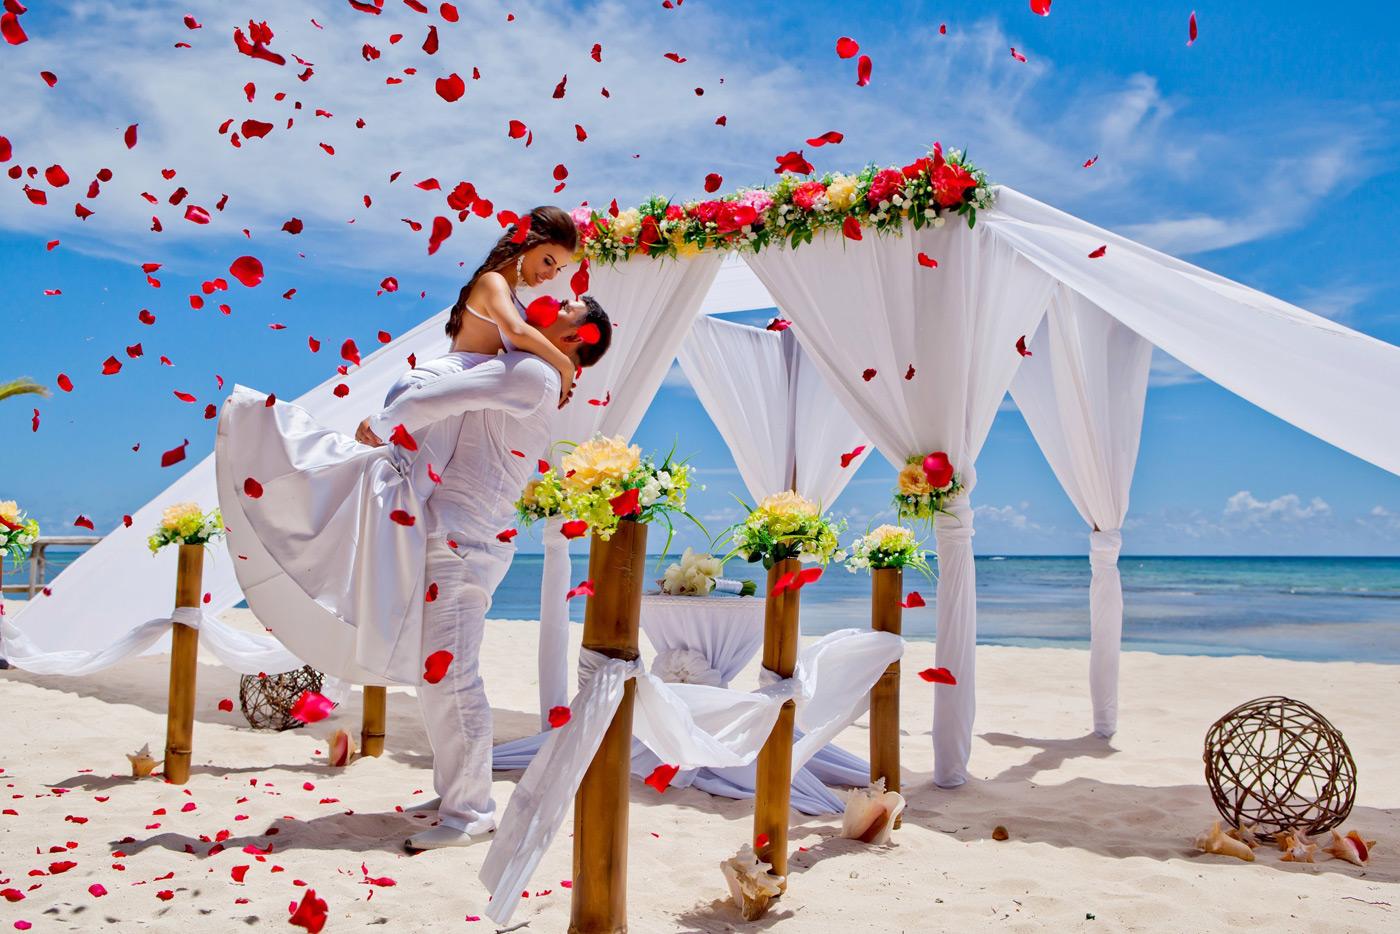 Свадьба в Доминикане: романтика и отдых